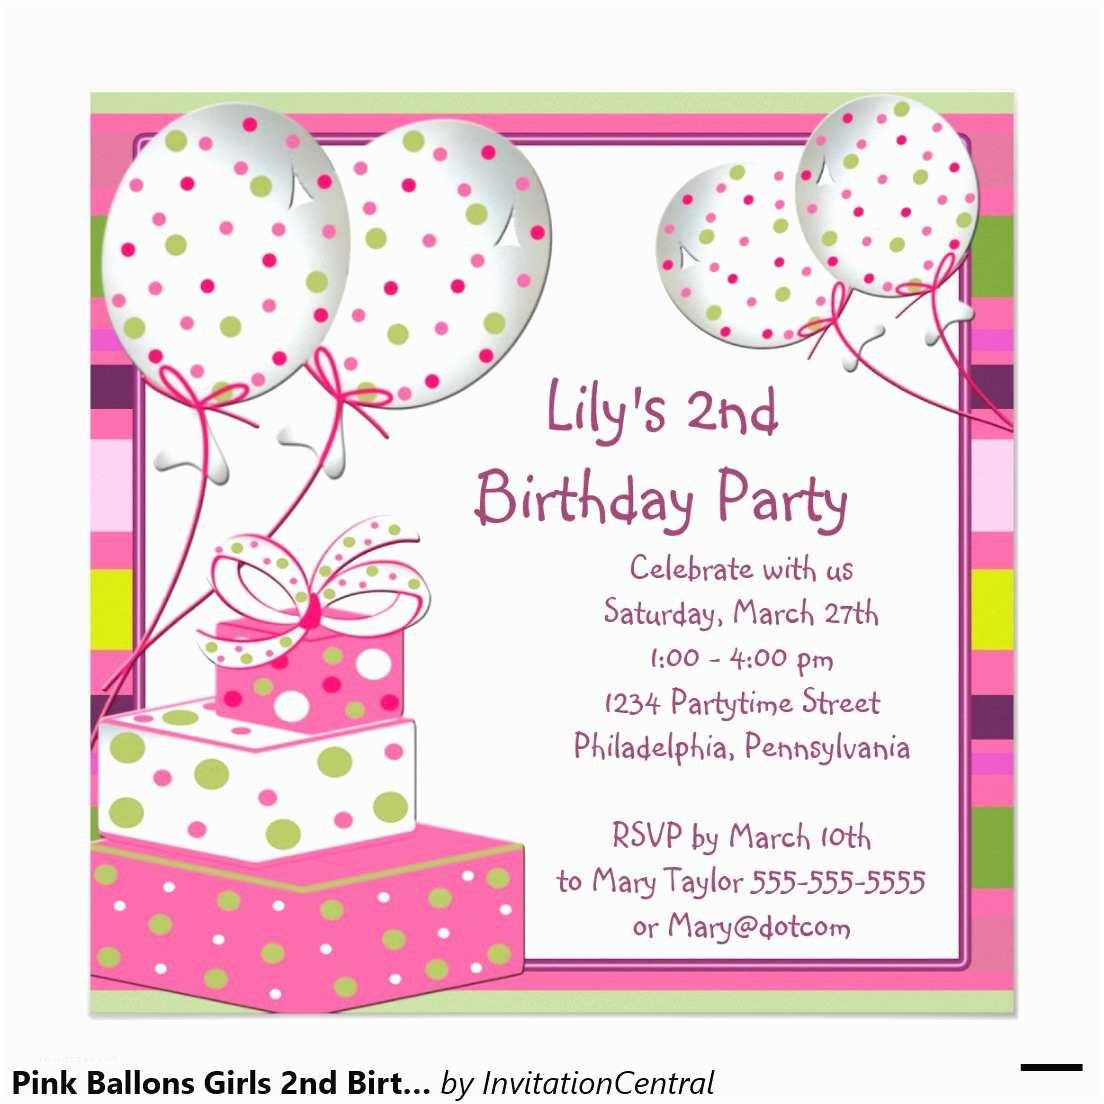 Birthday Party Invitations Birthday Party Invitation